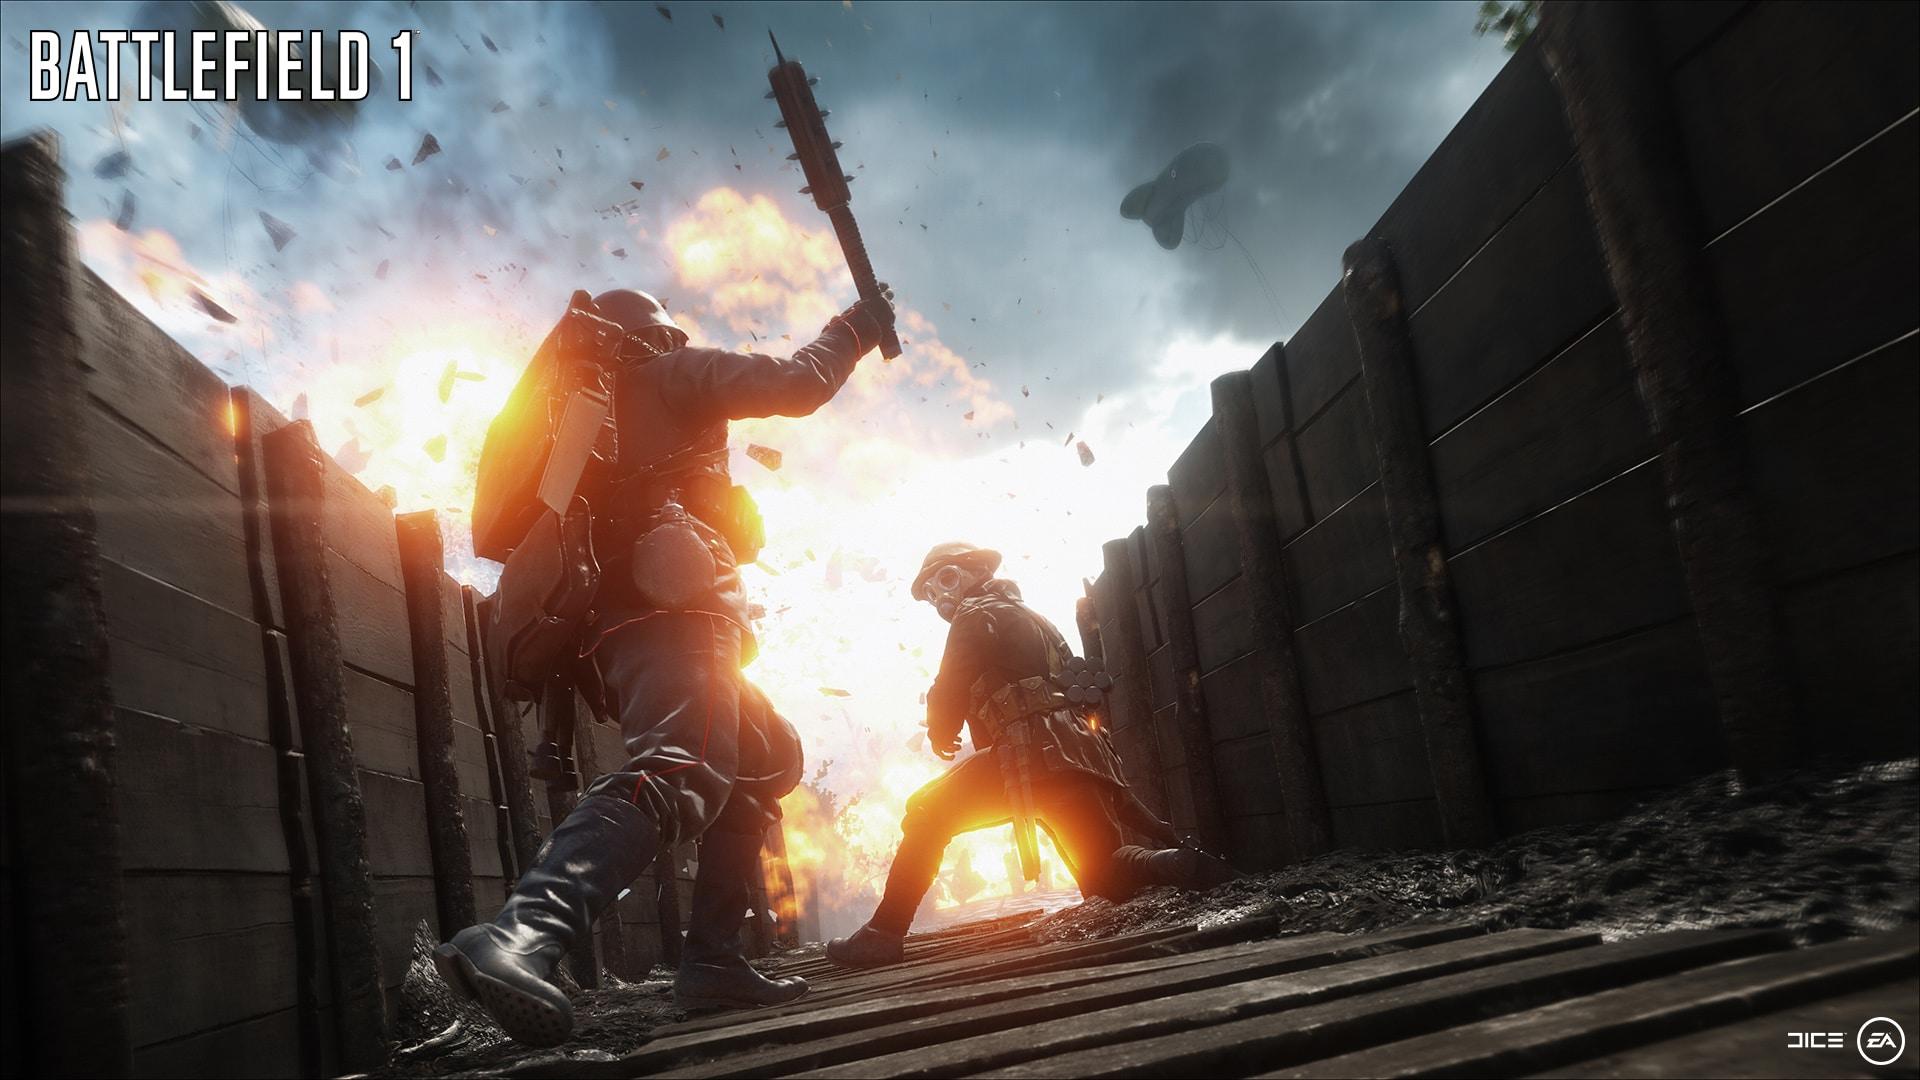 Neuer Battlefield 1 Screenshot -Trench Warfare